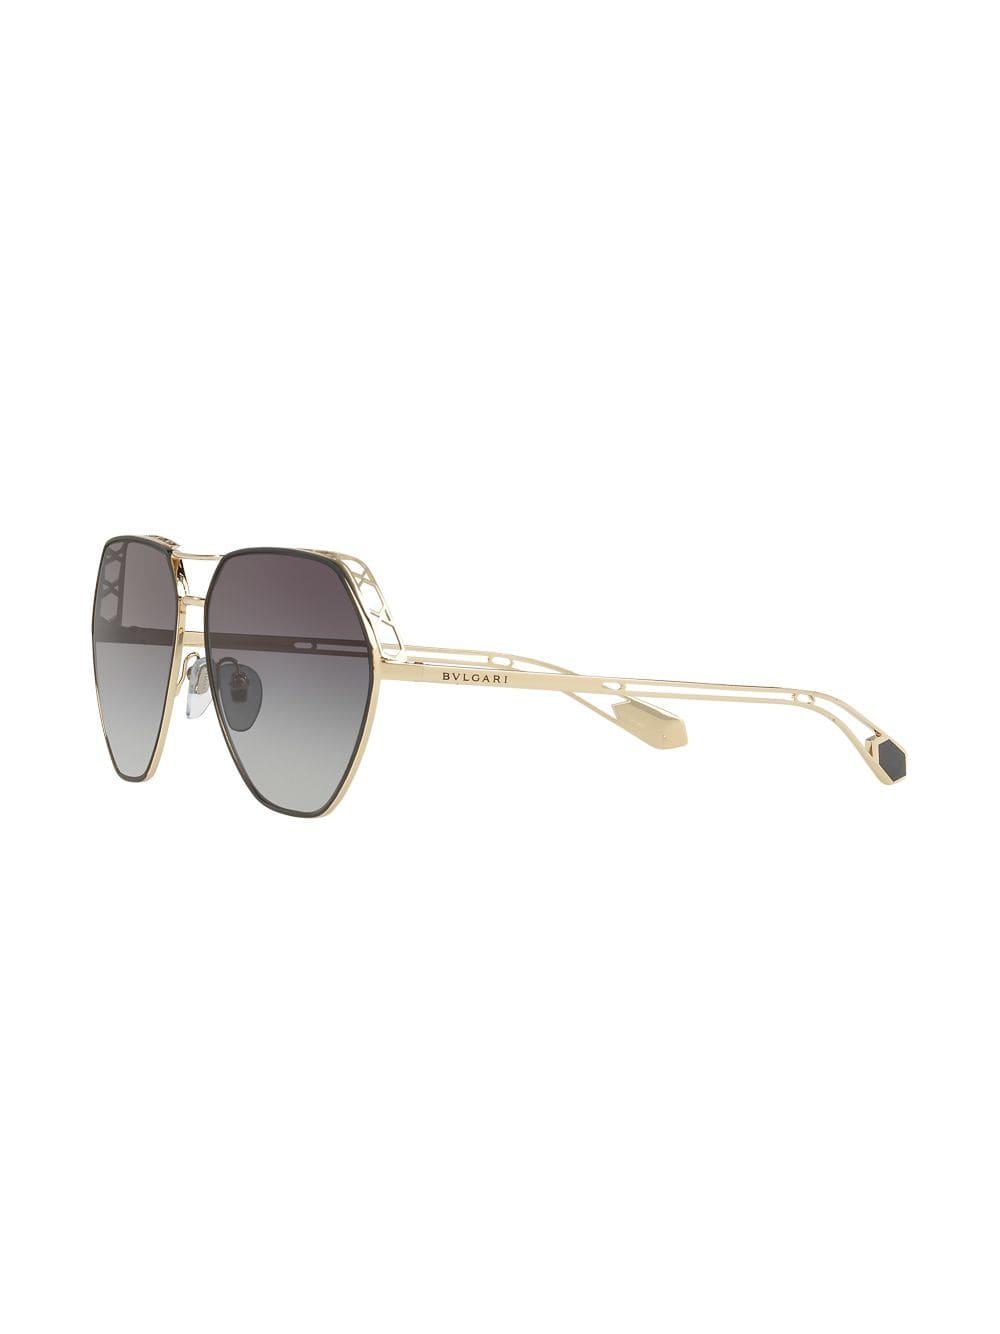 Bvlgari Hexagonal Metallic Sunglasses Lyst Frame In xABwzYaq